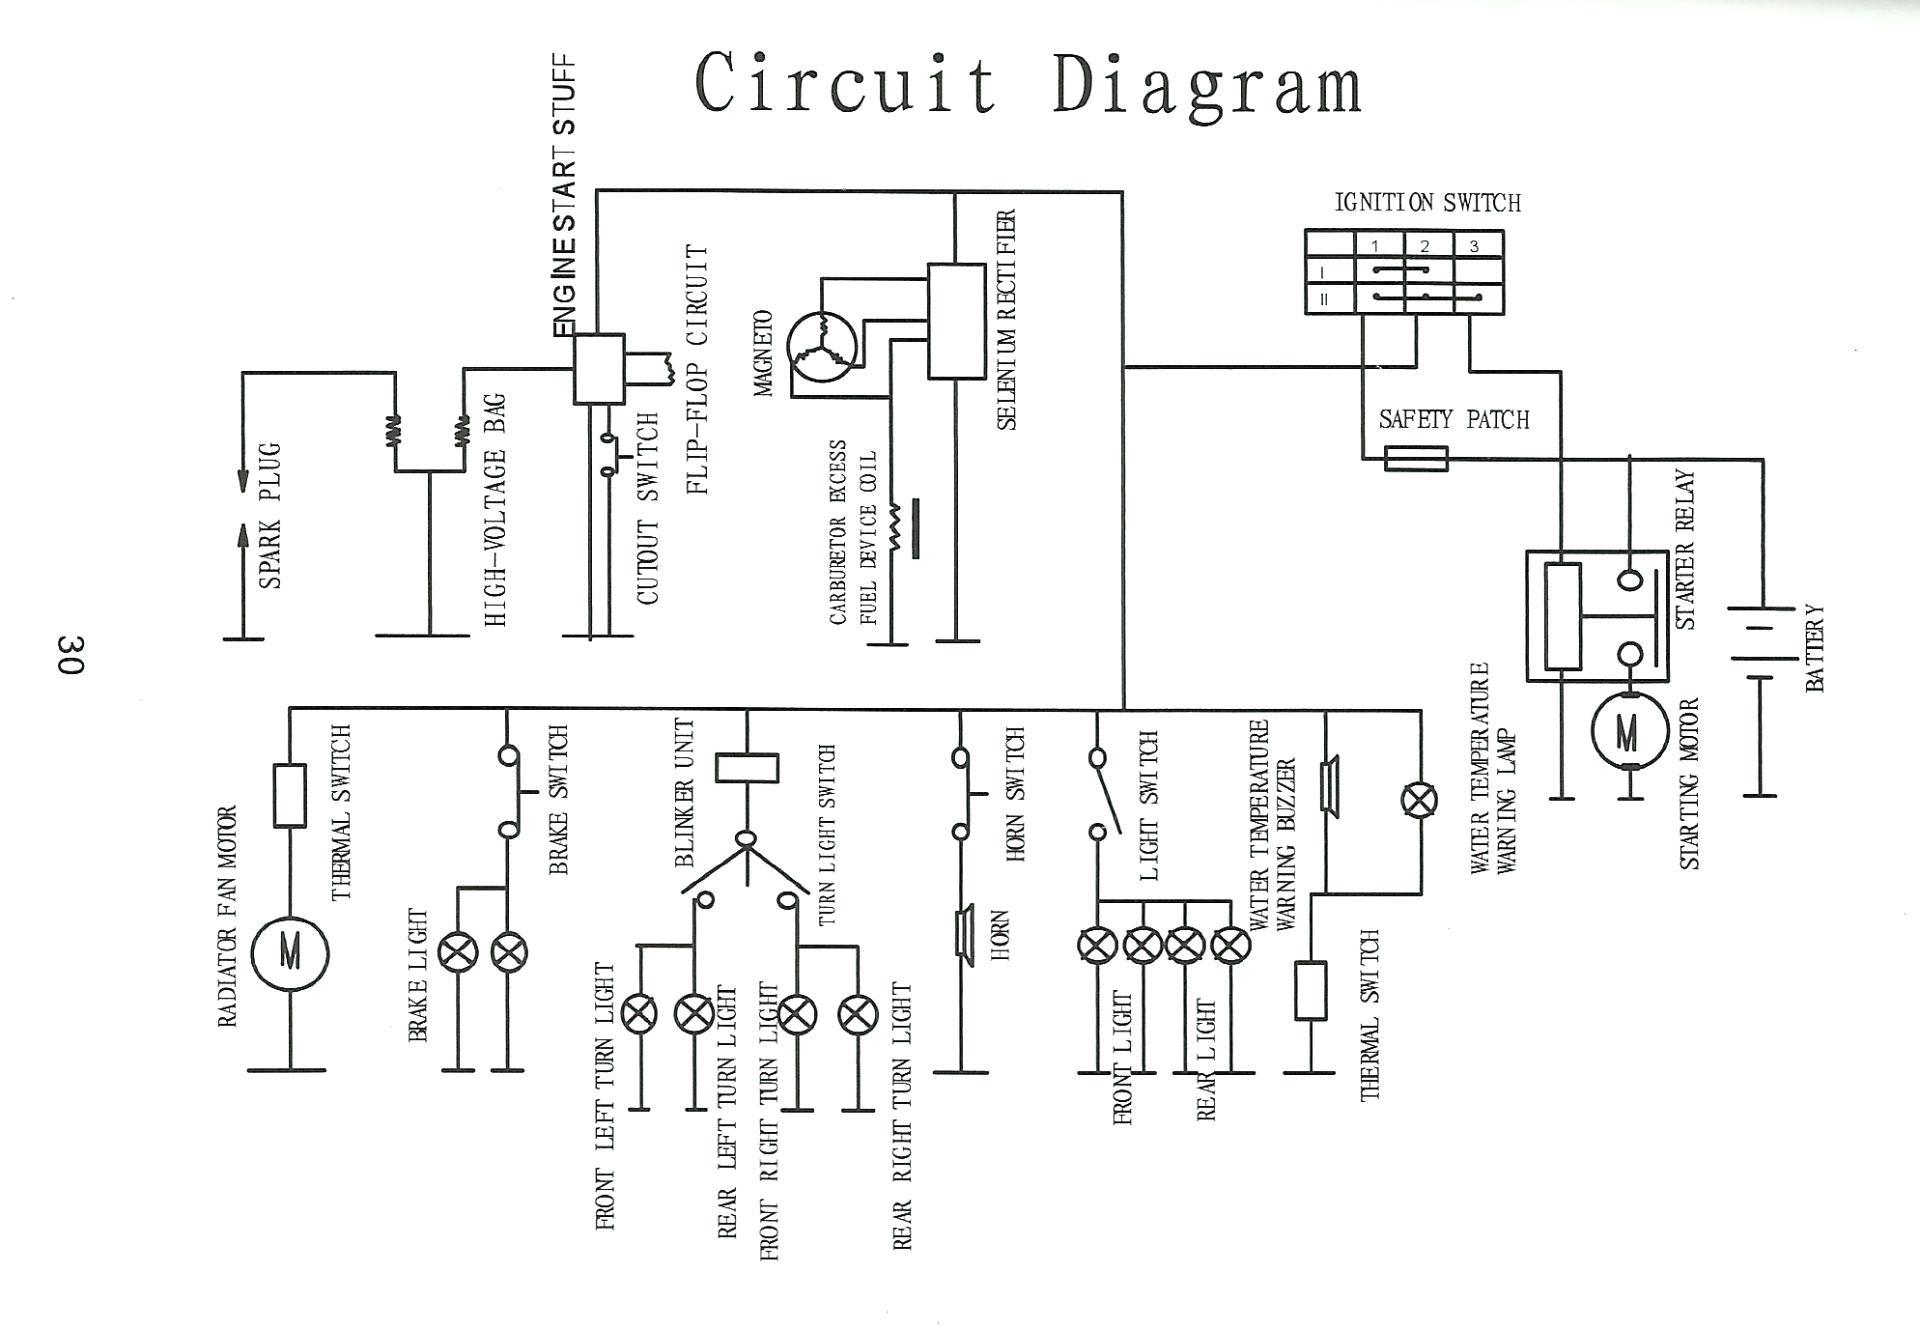 Manco Talon Atv Wiring Diagram